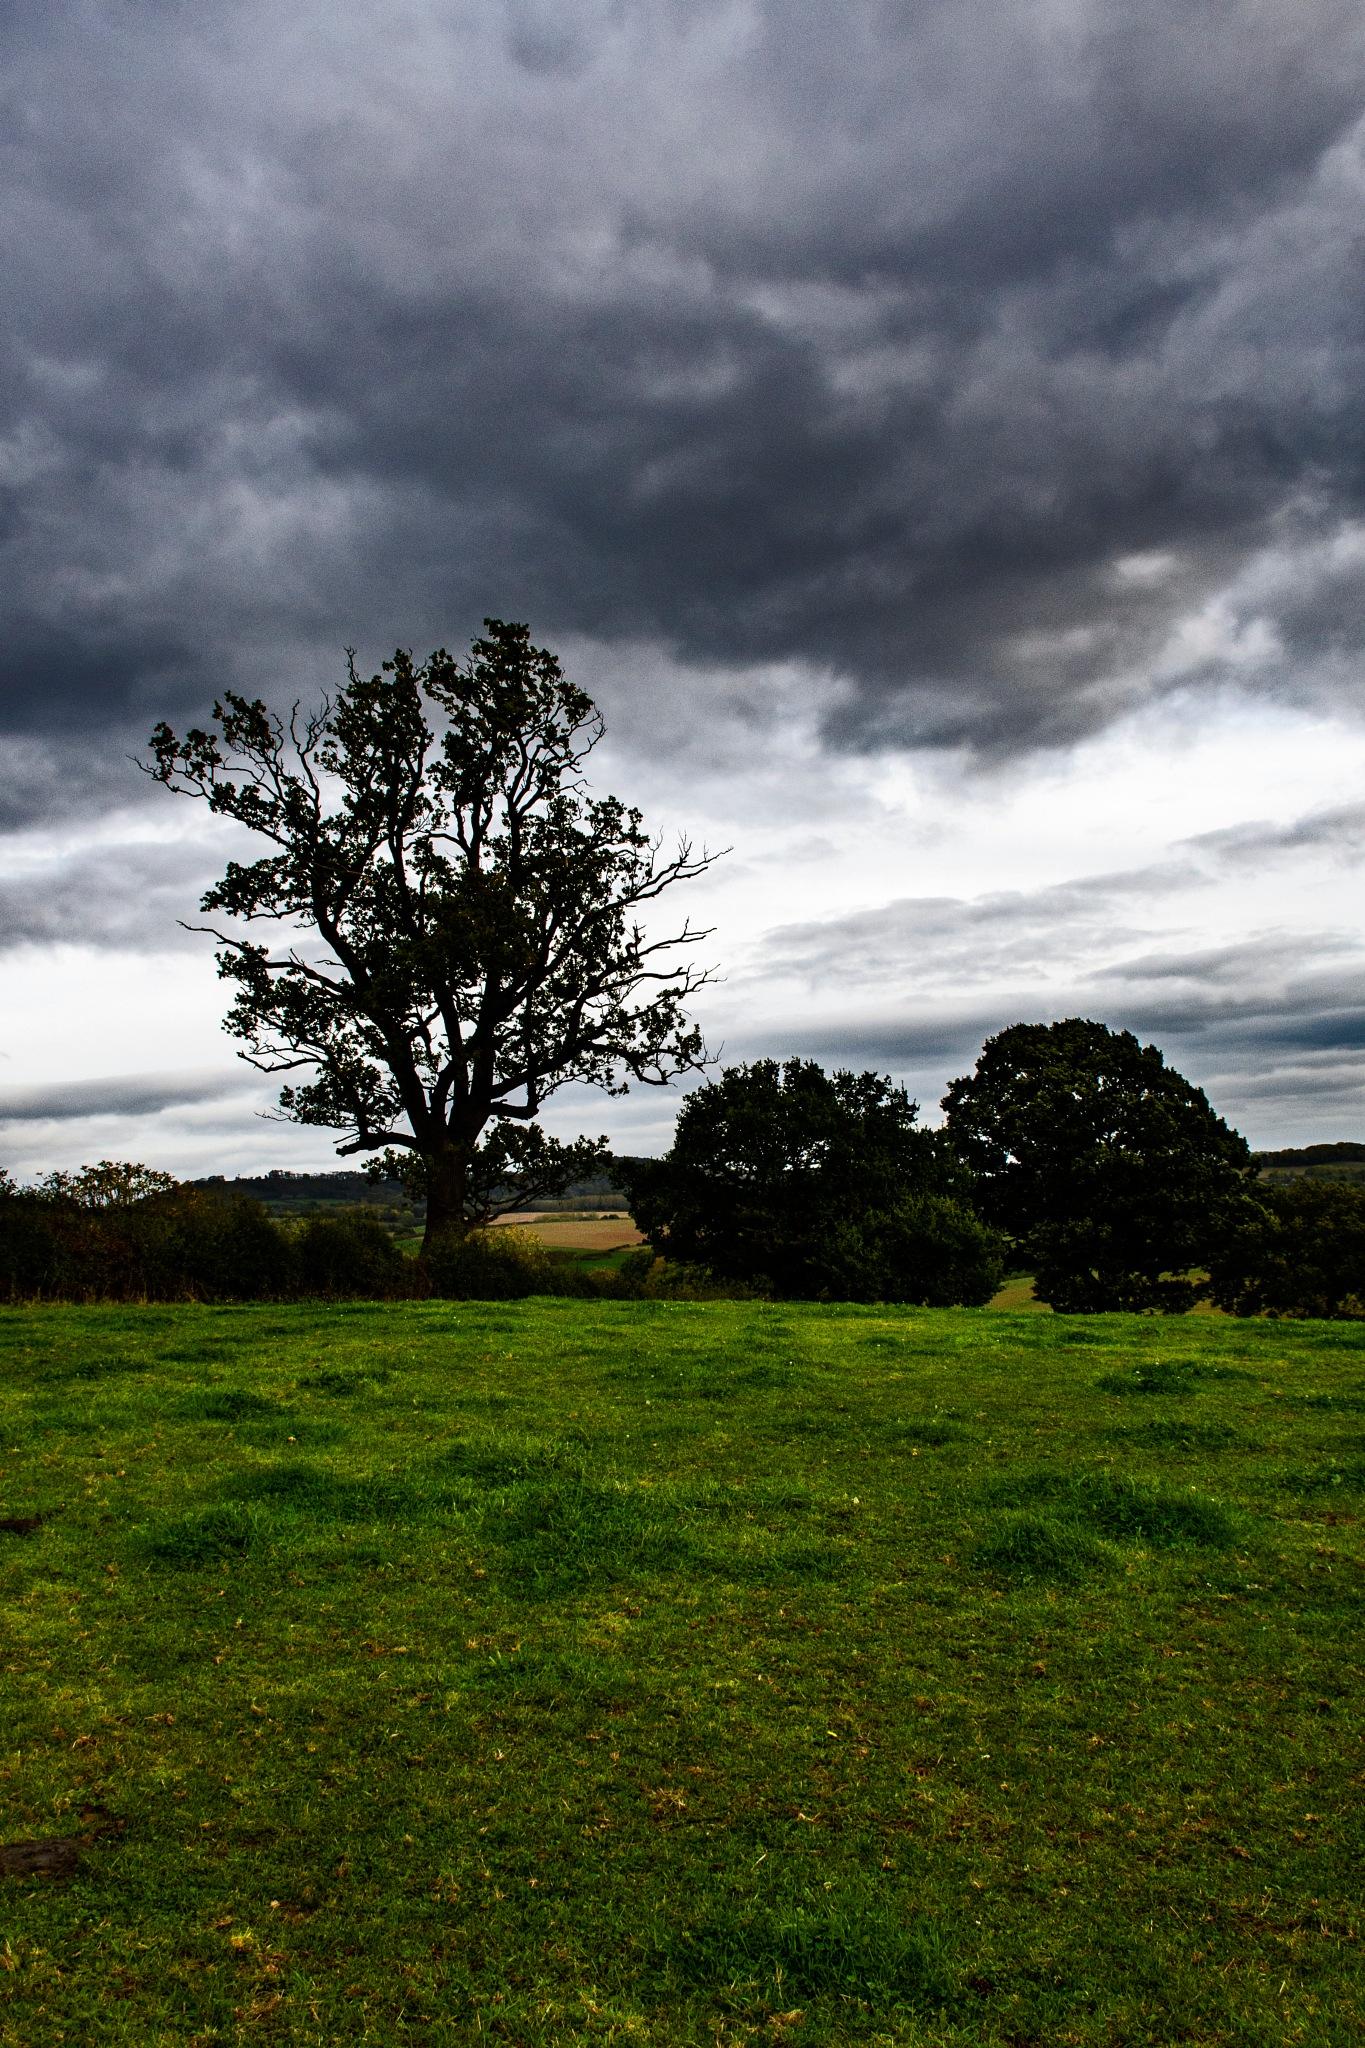 Stormy Silhouette by Tom P